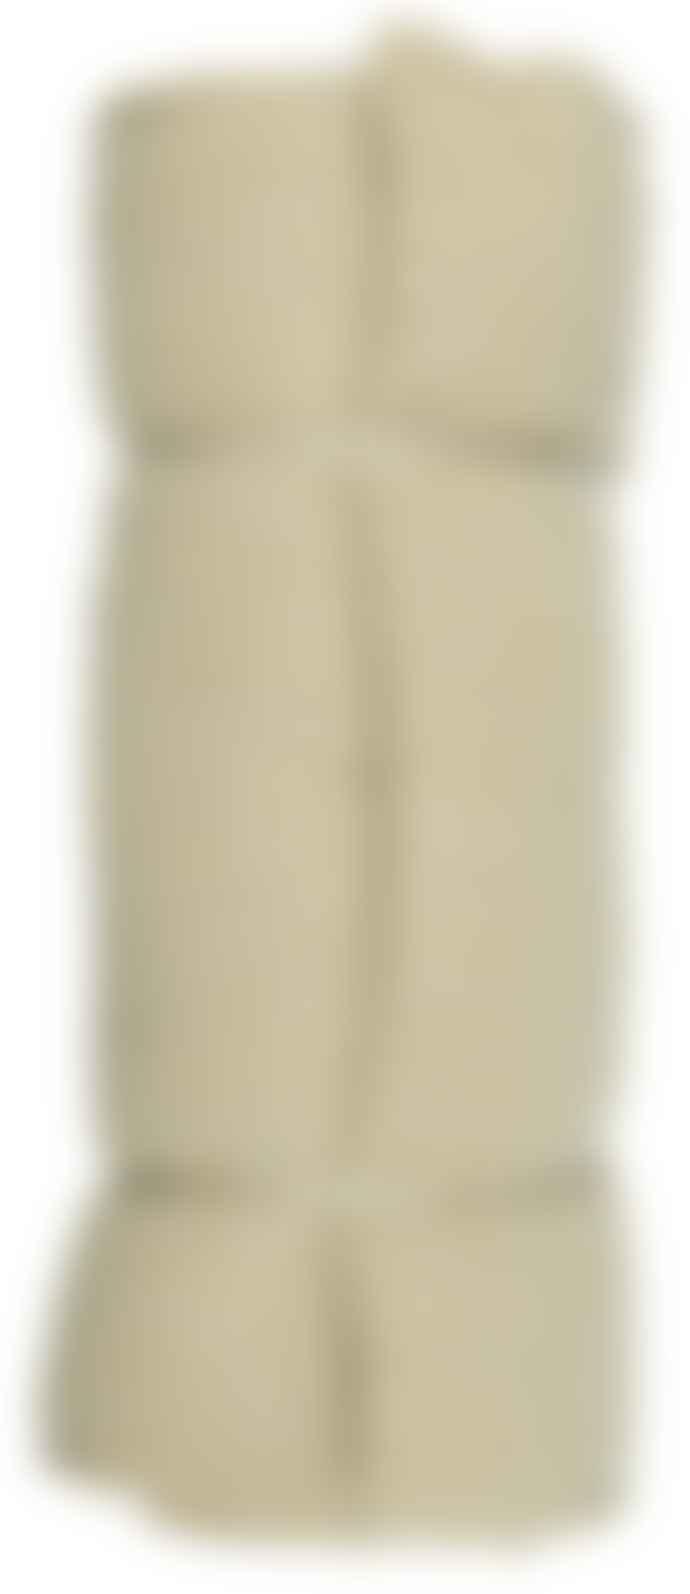 Ib Laursen Yellow and Cream Striped Woven Cushion Mattress